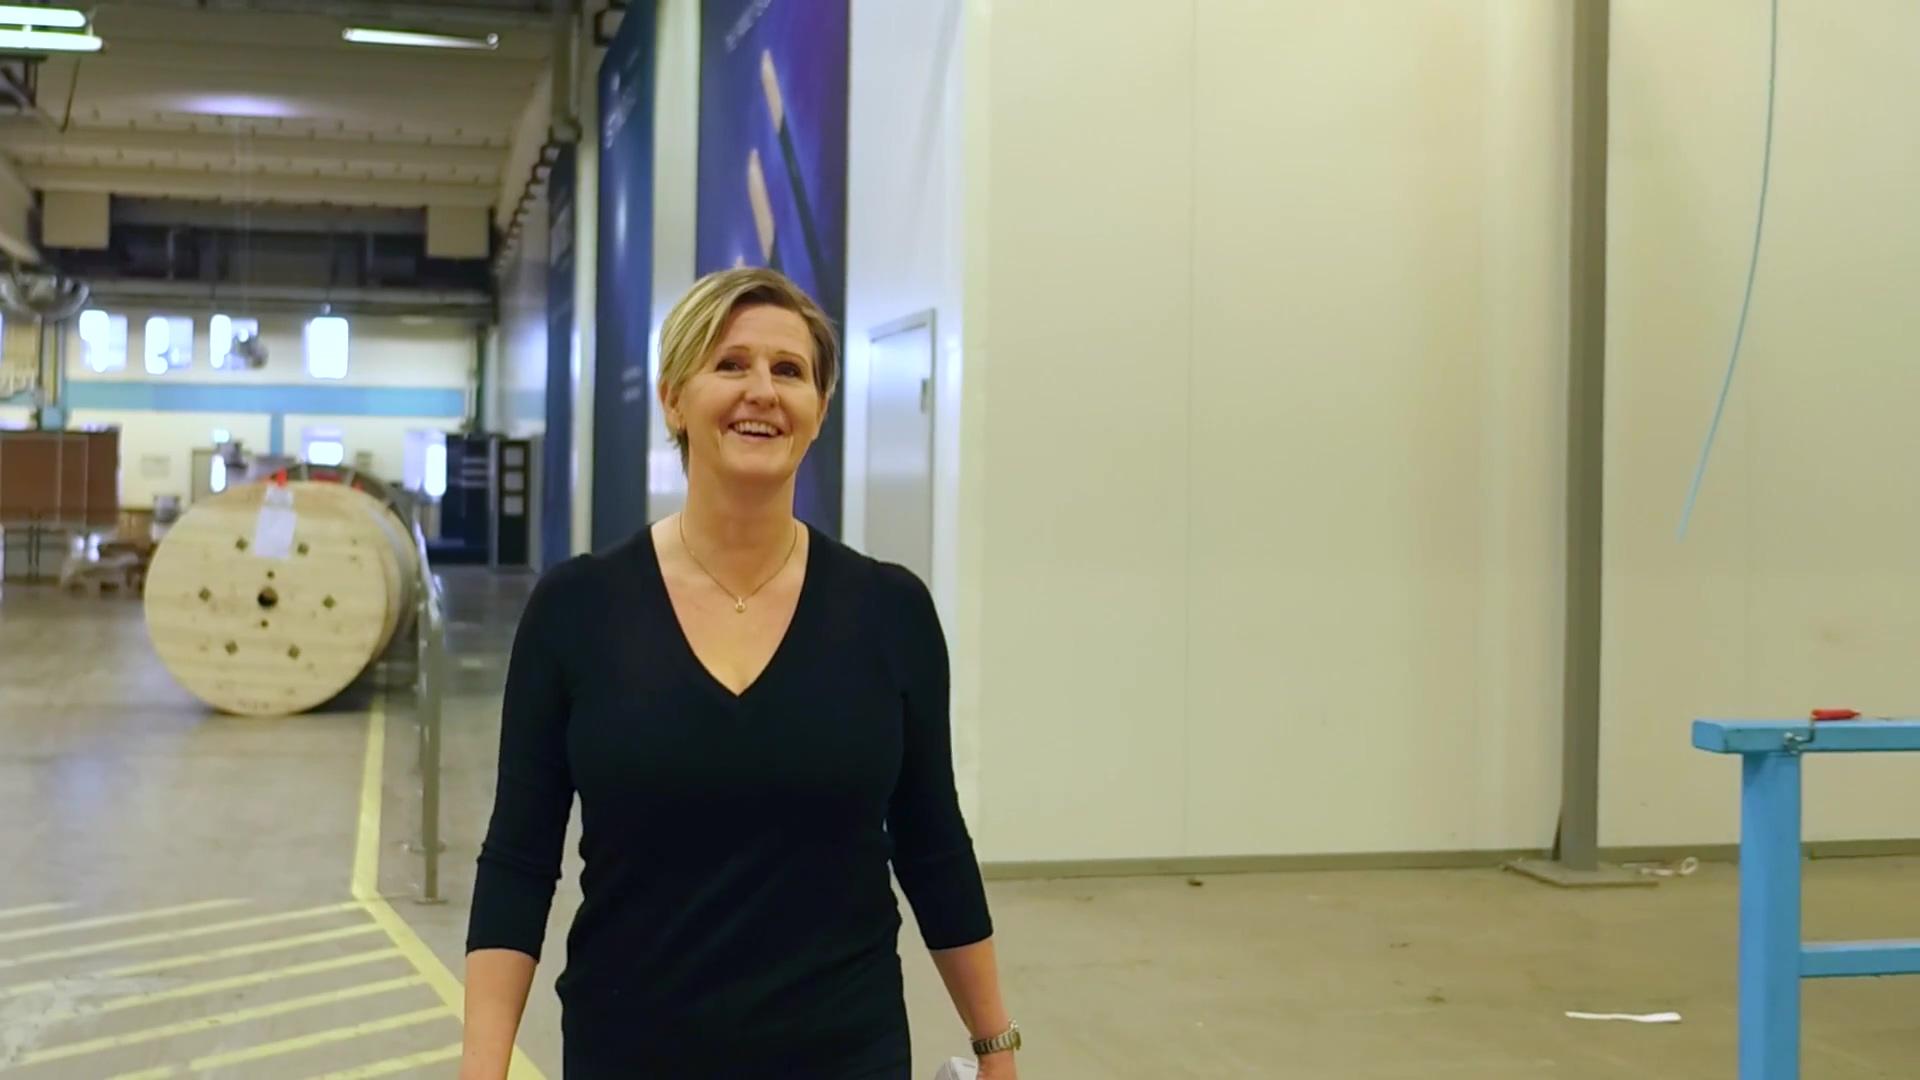 I Work Here – Mia Olsson (EN subtitles) (1)